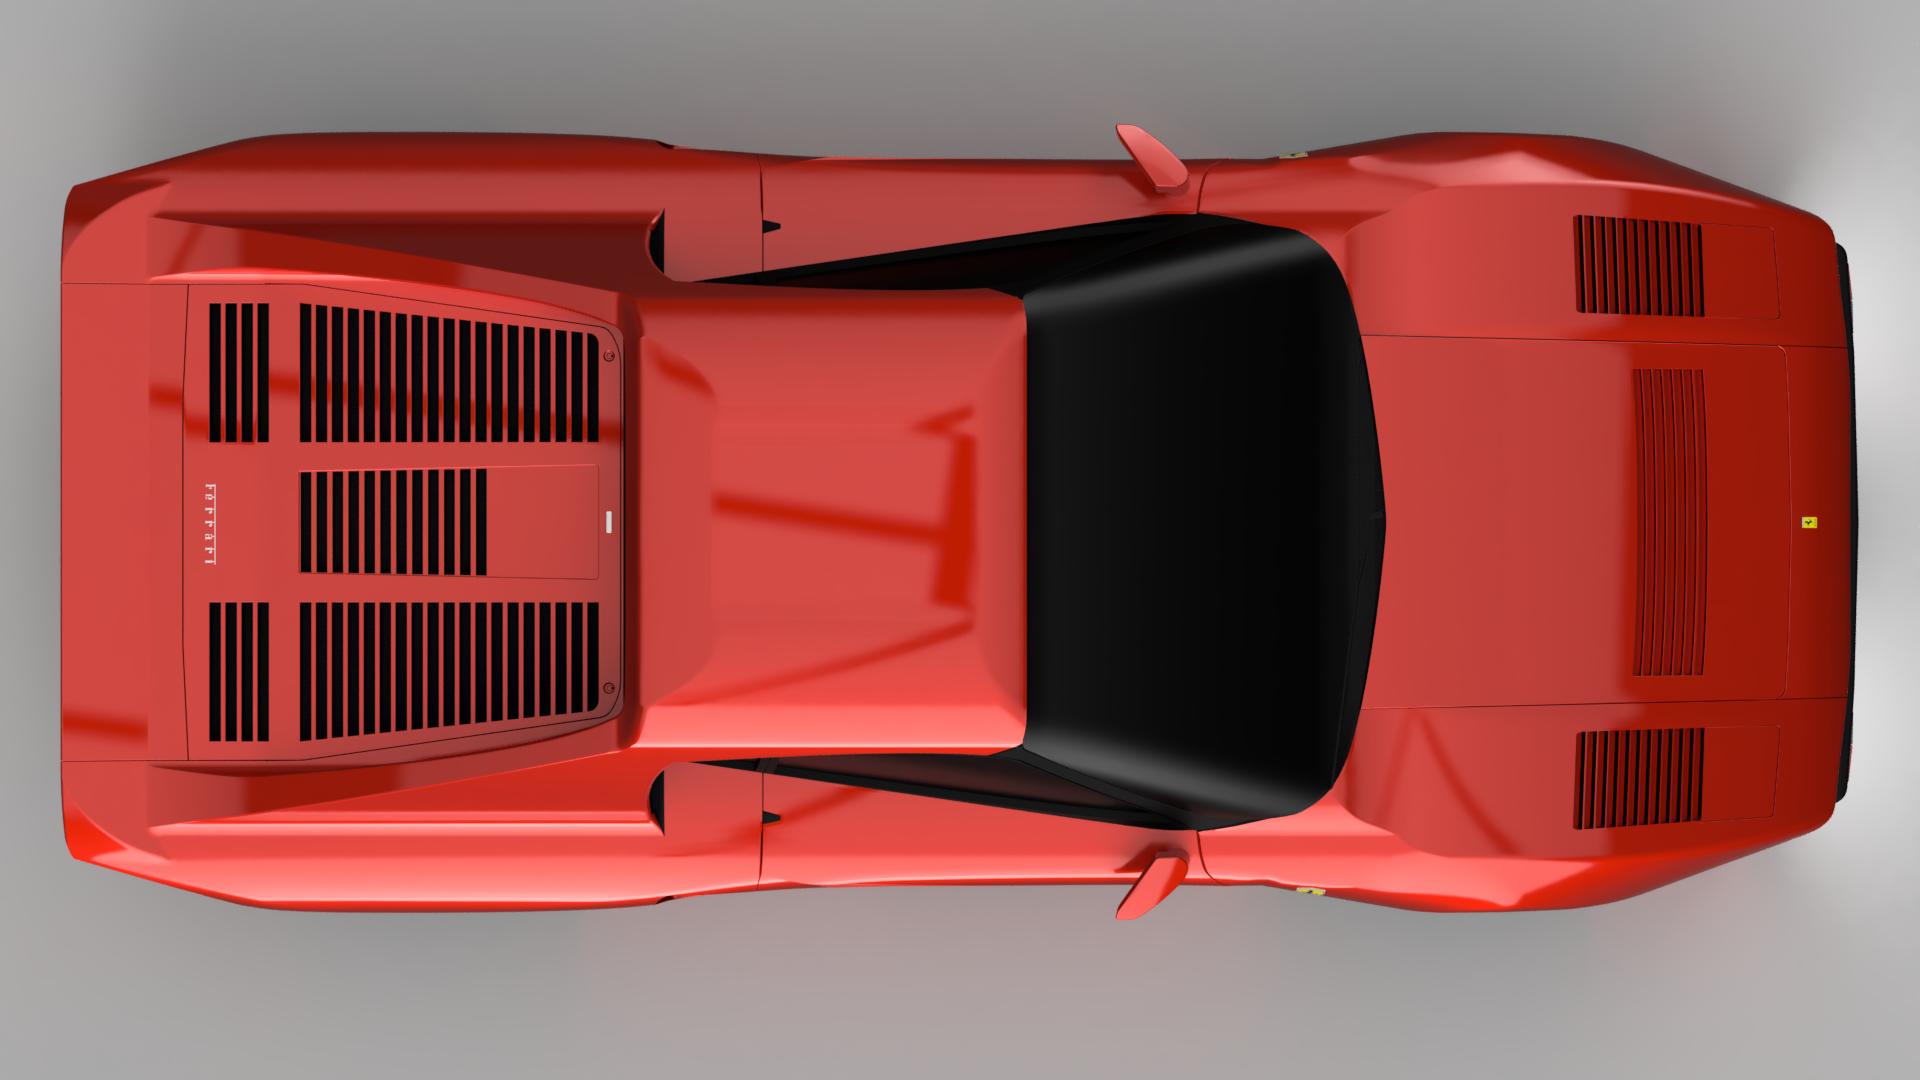 2019 car challenge - Ferrari 288 GTO